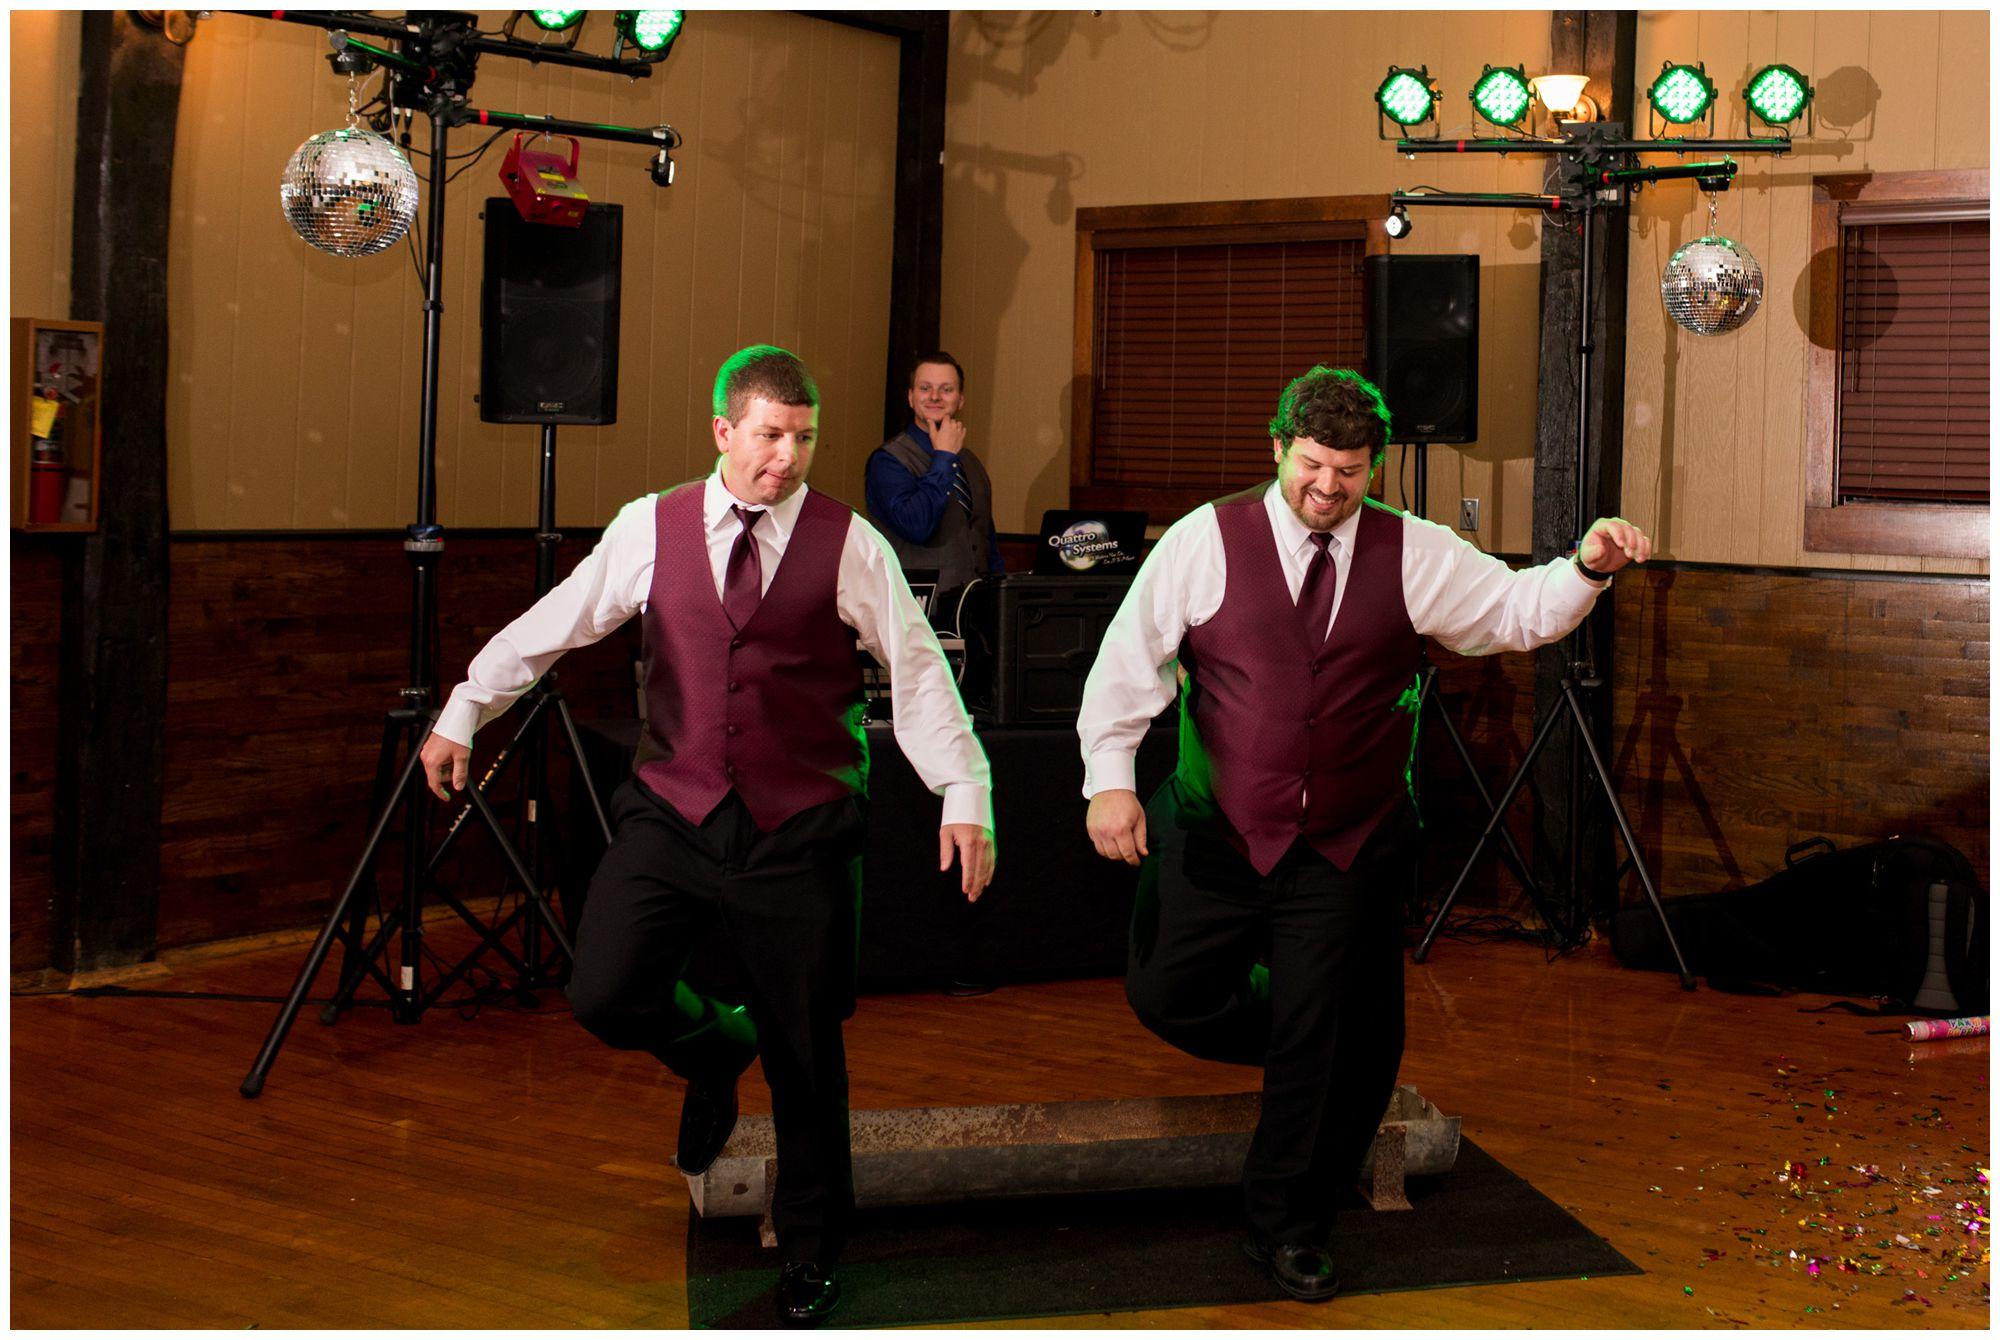 groom's brothers dance around hog trough during wedding reception at Goeglein Homestead